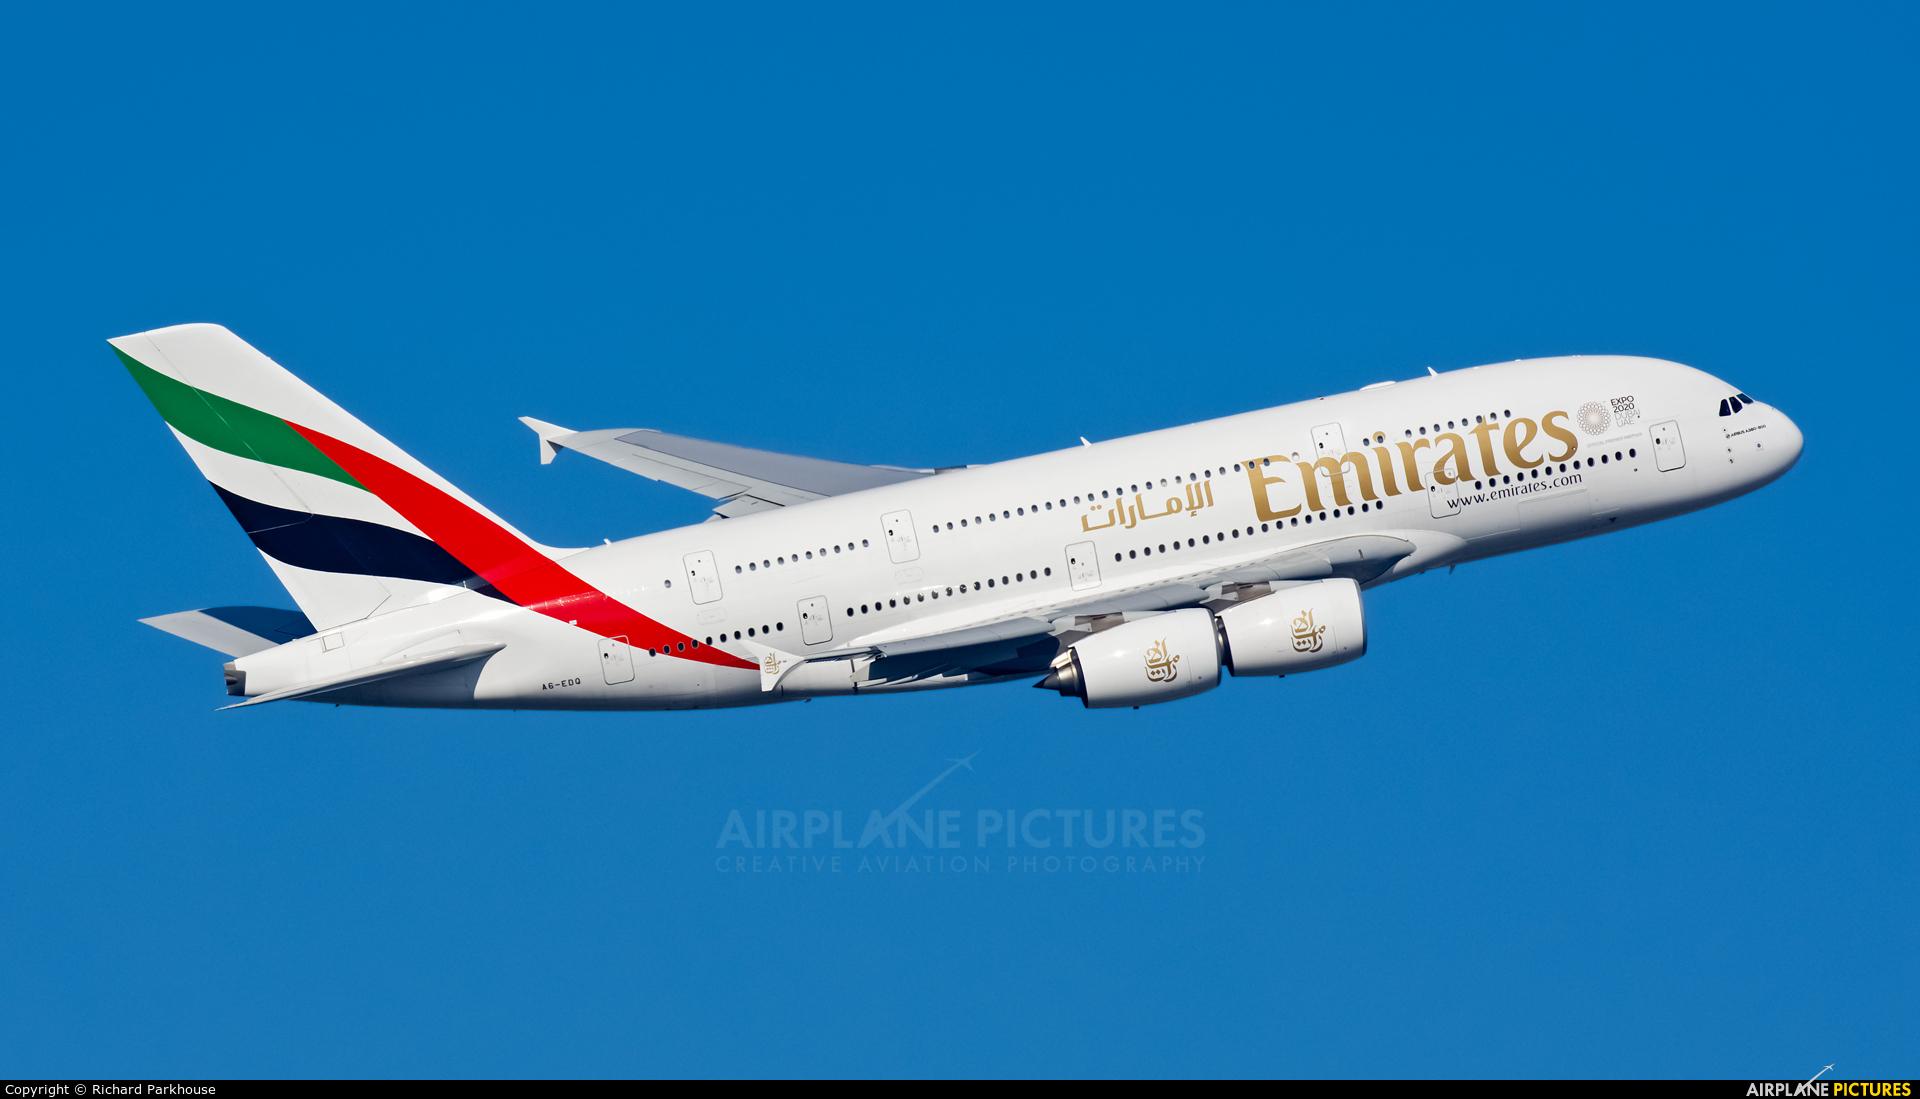 Emirates Airlines A6-EDQ aircraft at London - Heathrow